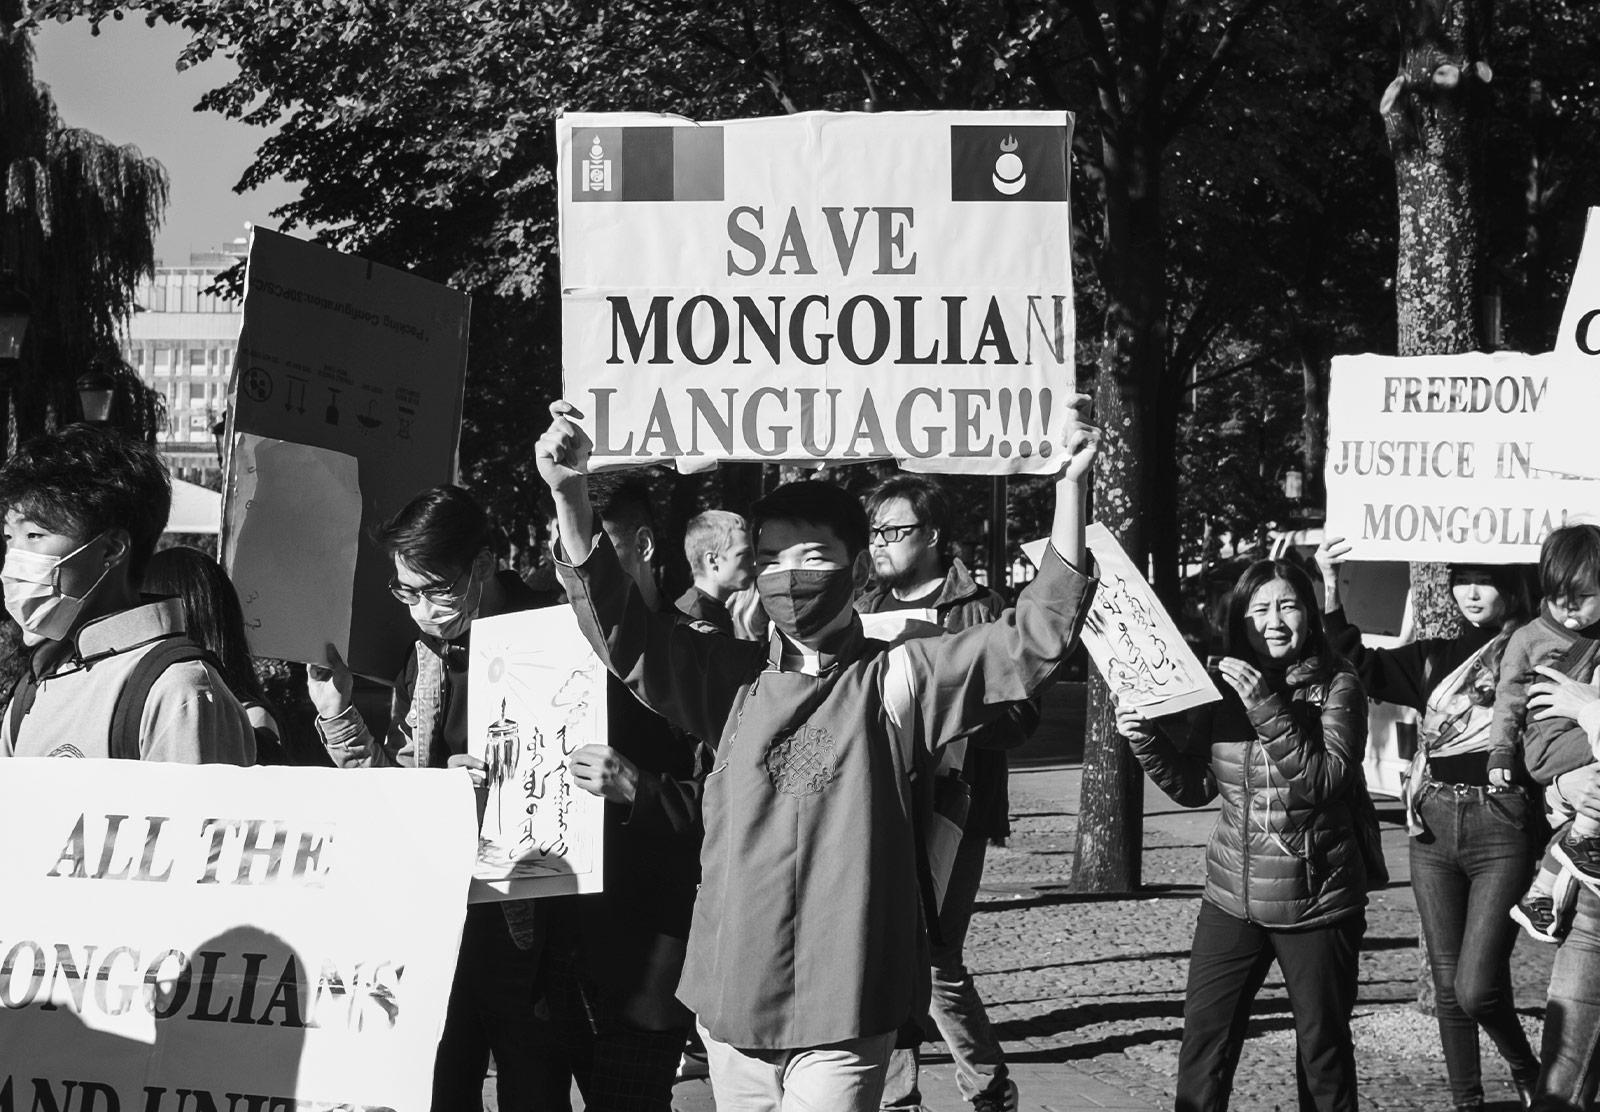 Mongolian language protest, Stockholm